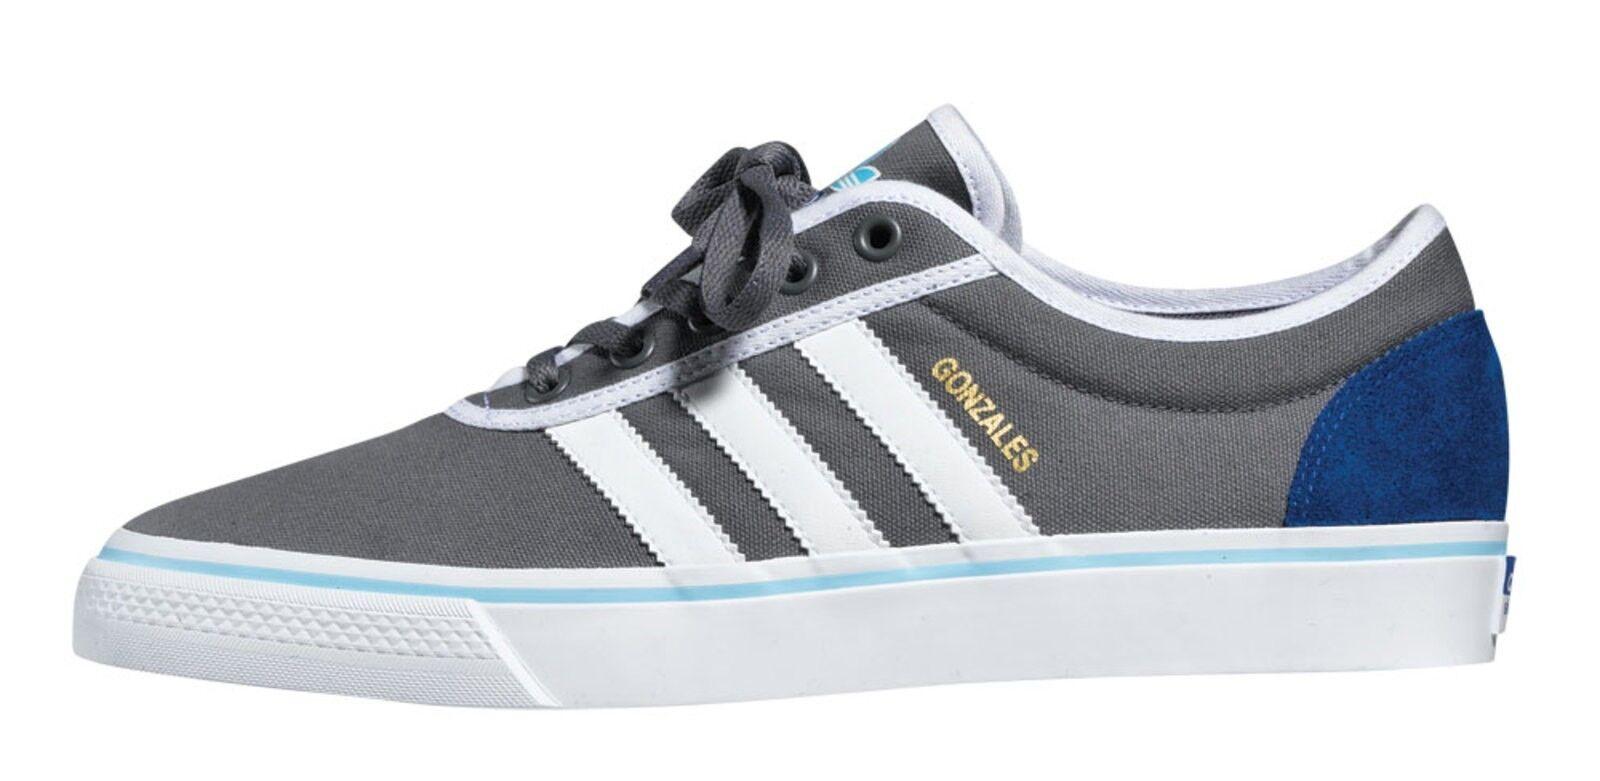 Adidas g48267 adi leicht wieder grau, weiß - blau skate g48267 Adidas gonzales (197) männer, schuhe 550423